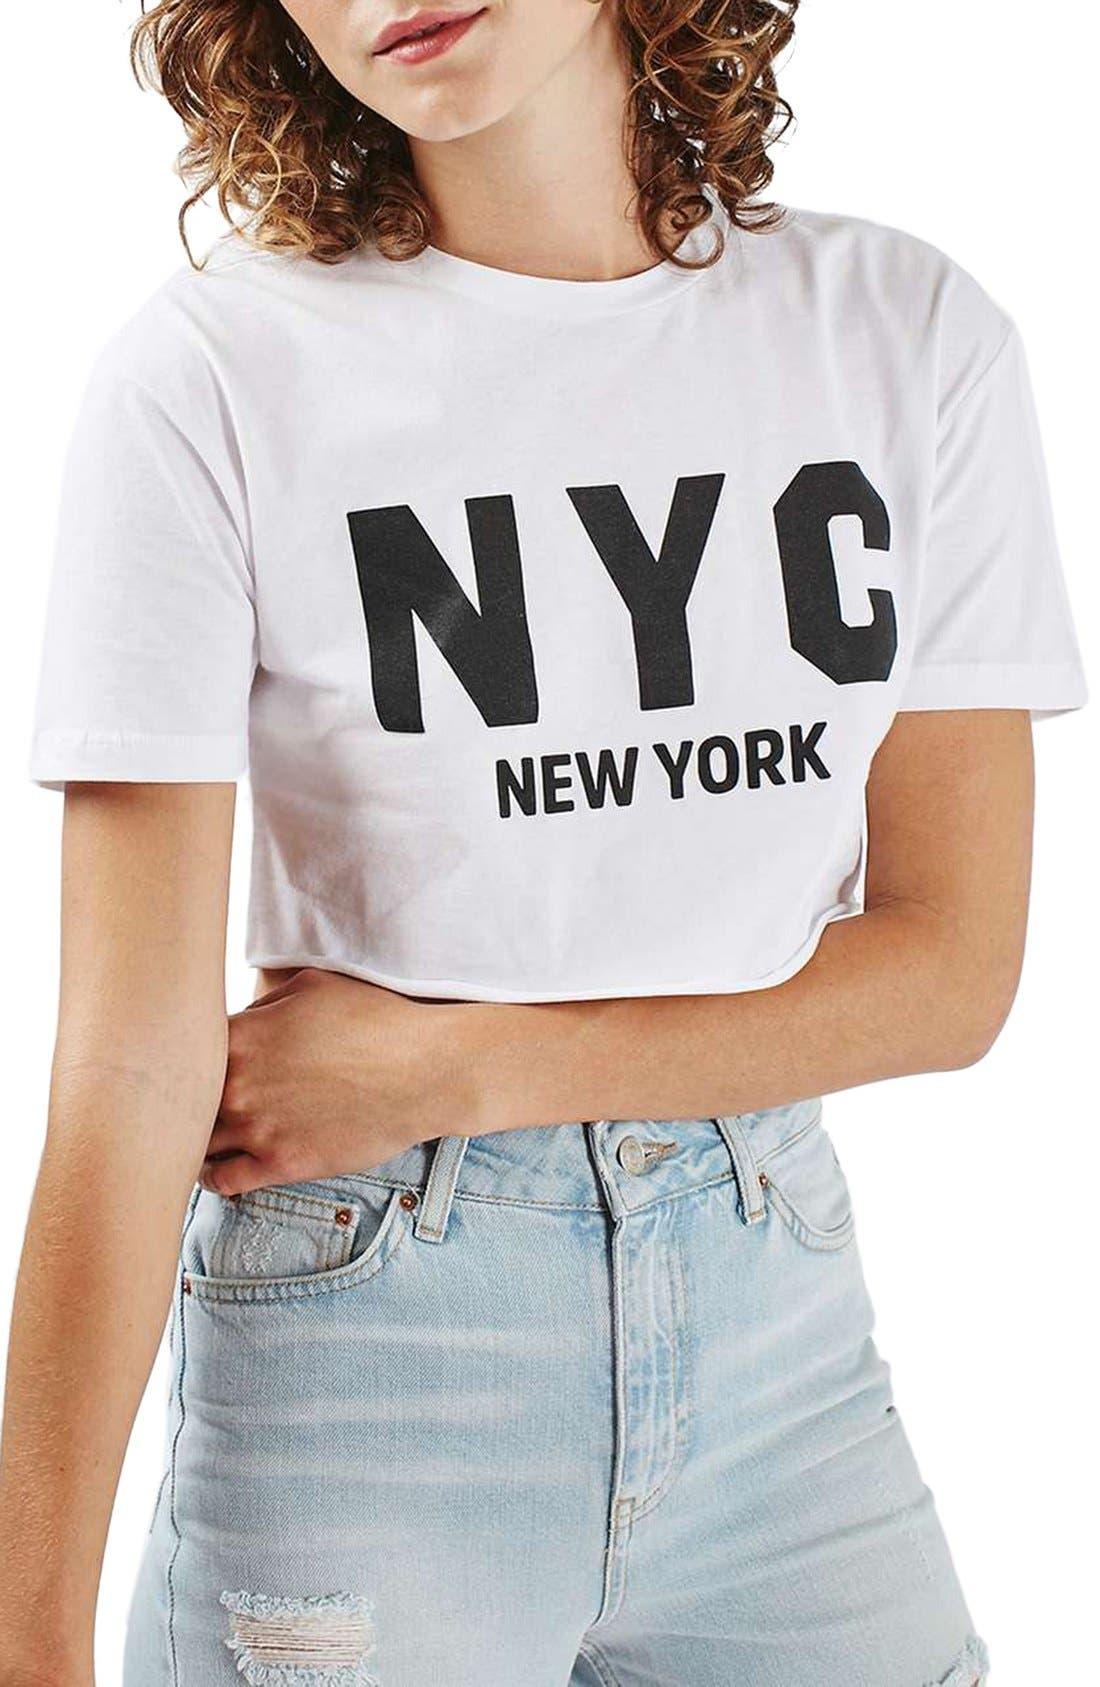 Main Image - Topshop New York Graphic Crop Top (Regular & Petite)